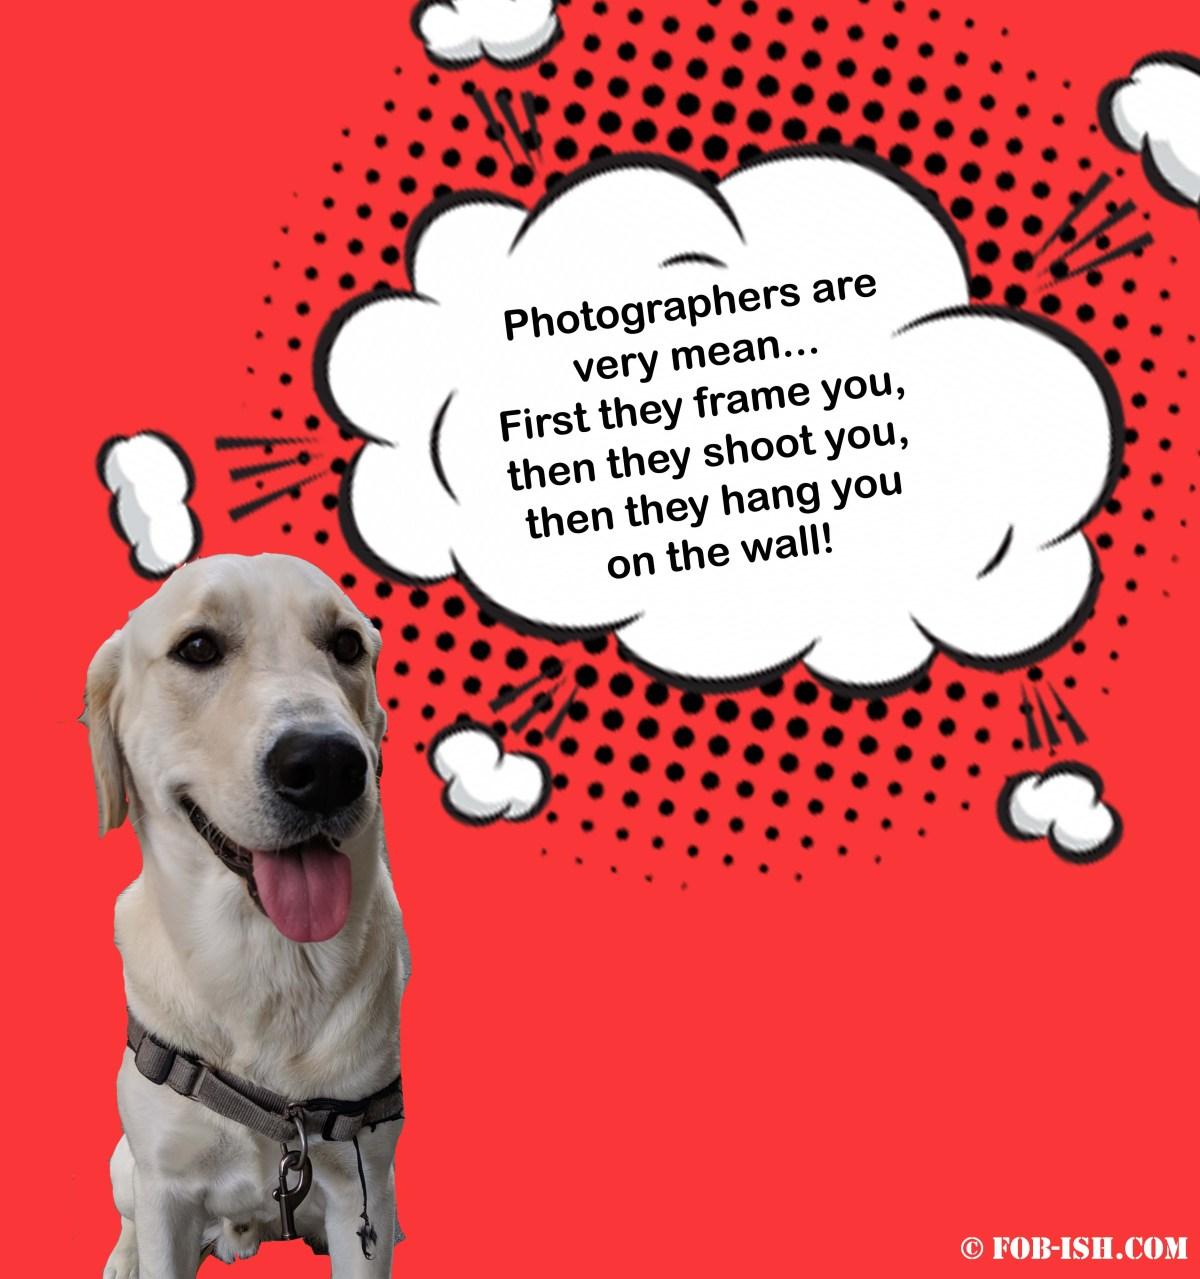 Dog saying something funny about street photography